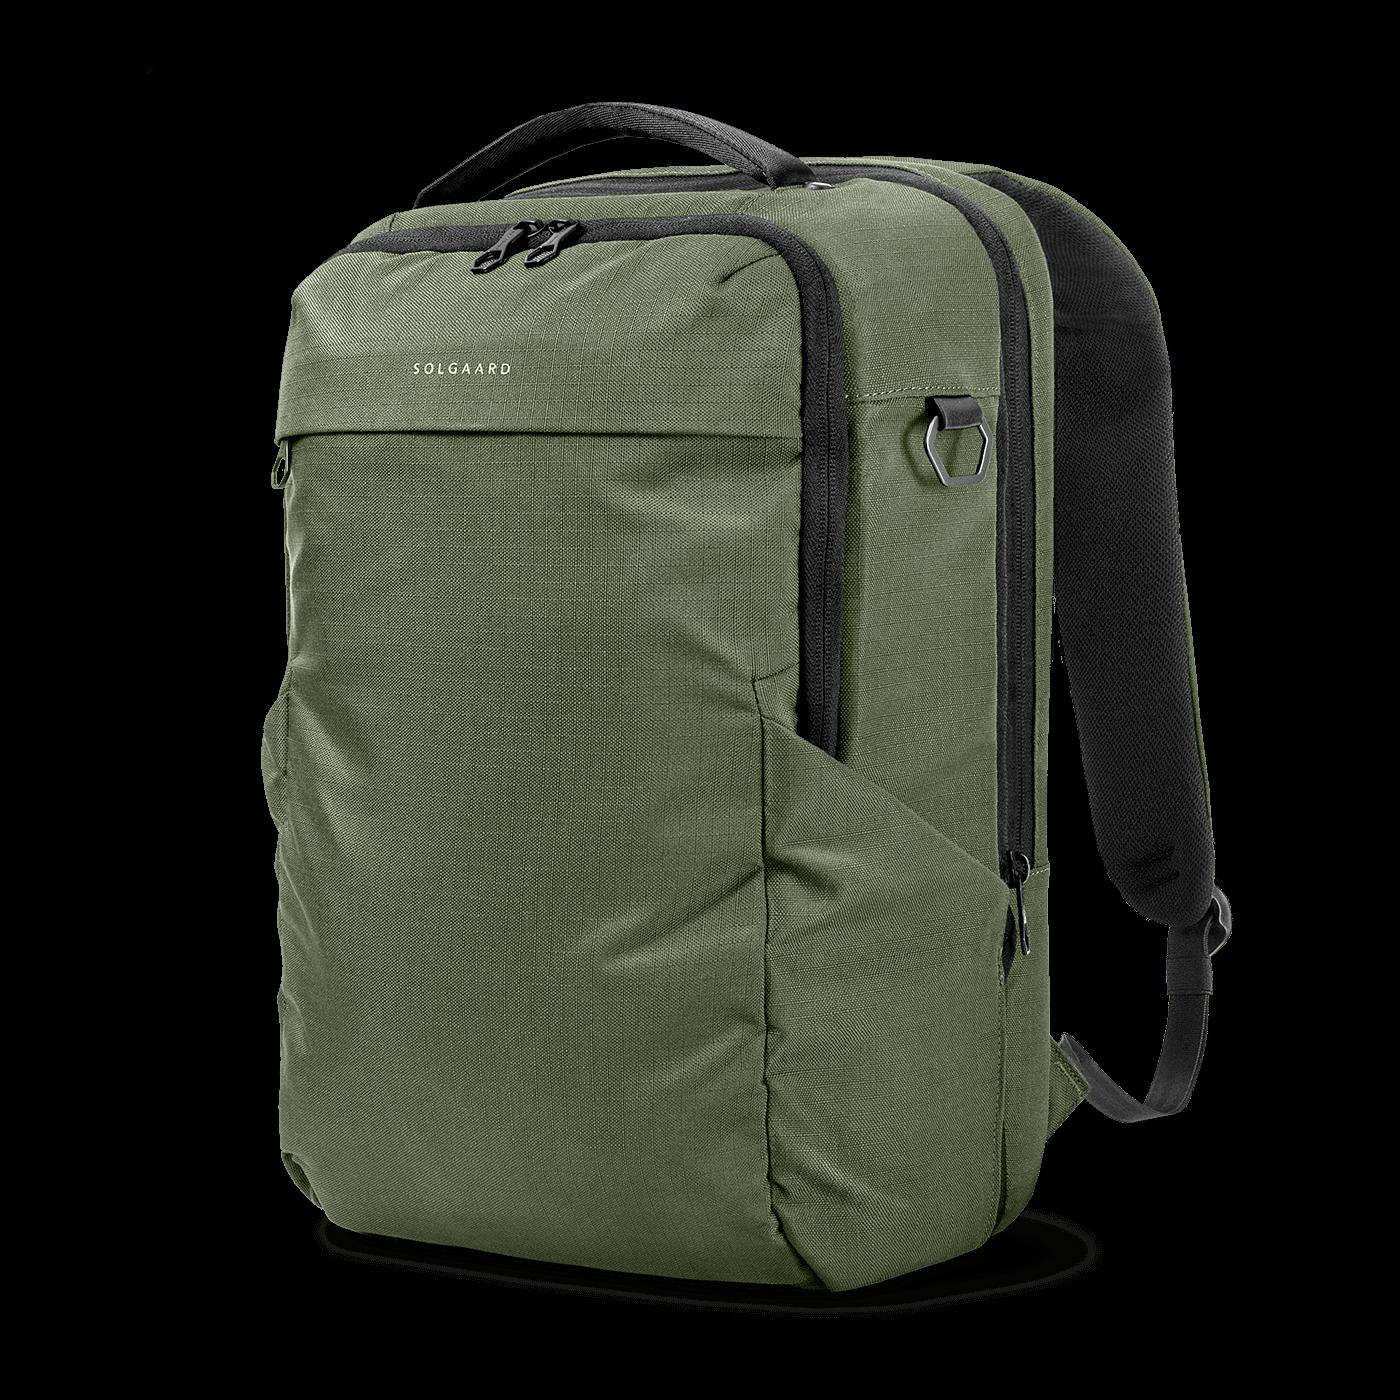 Lifepack Endeavor Bag